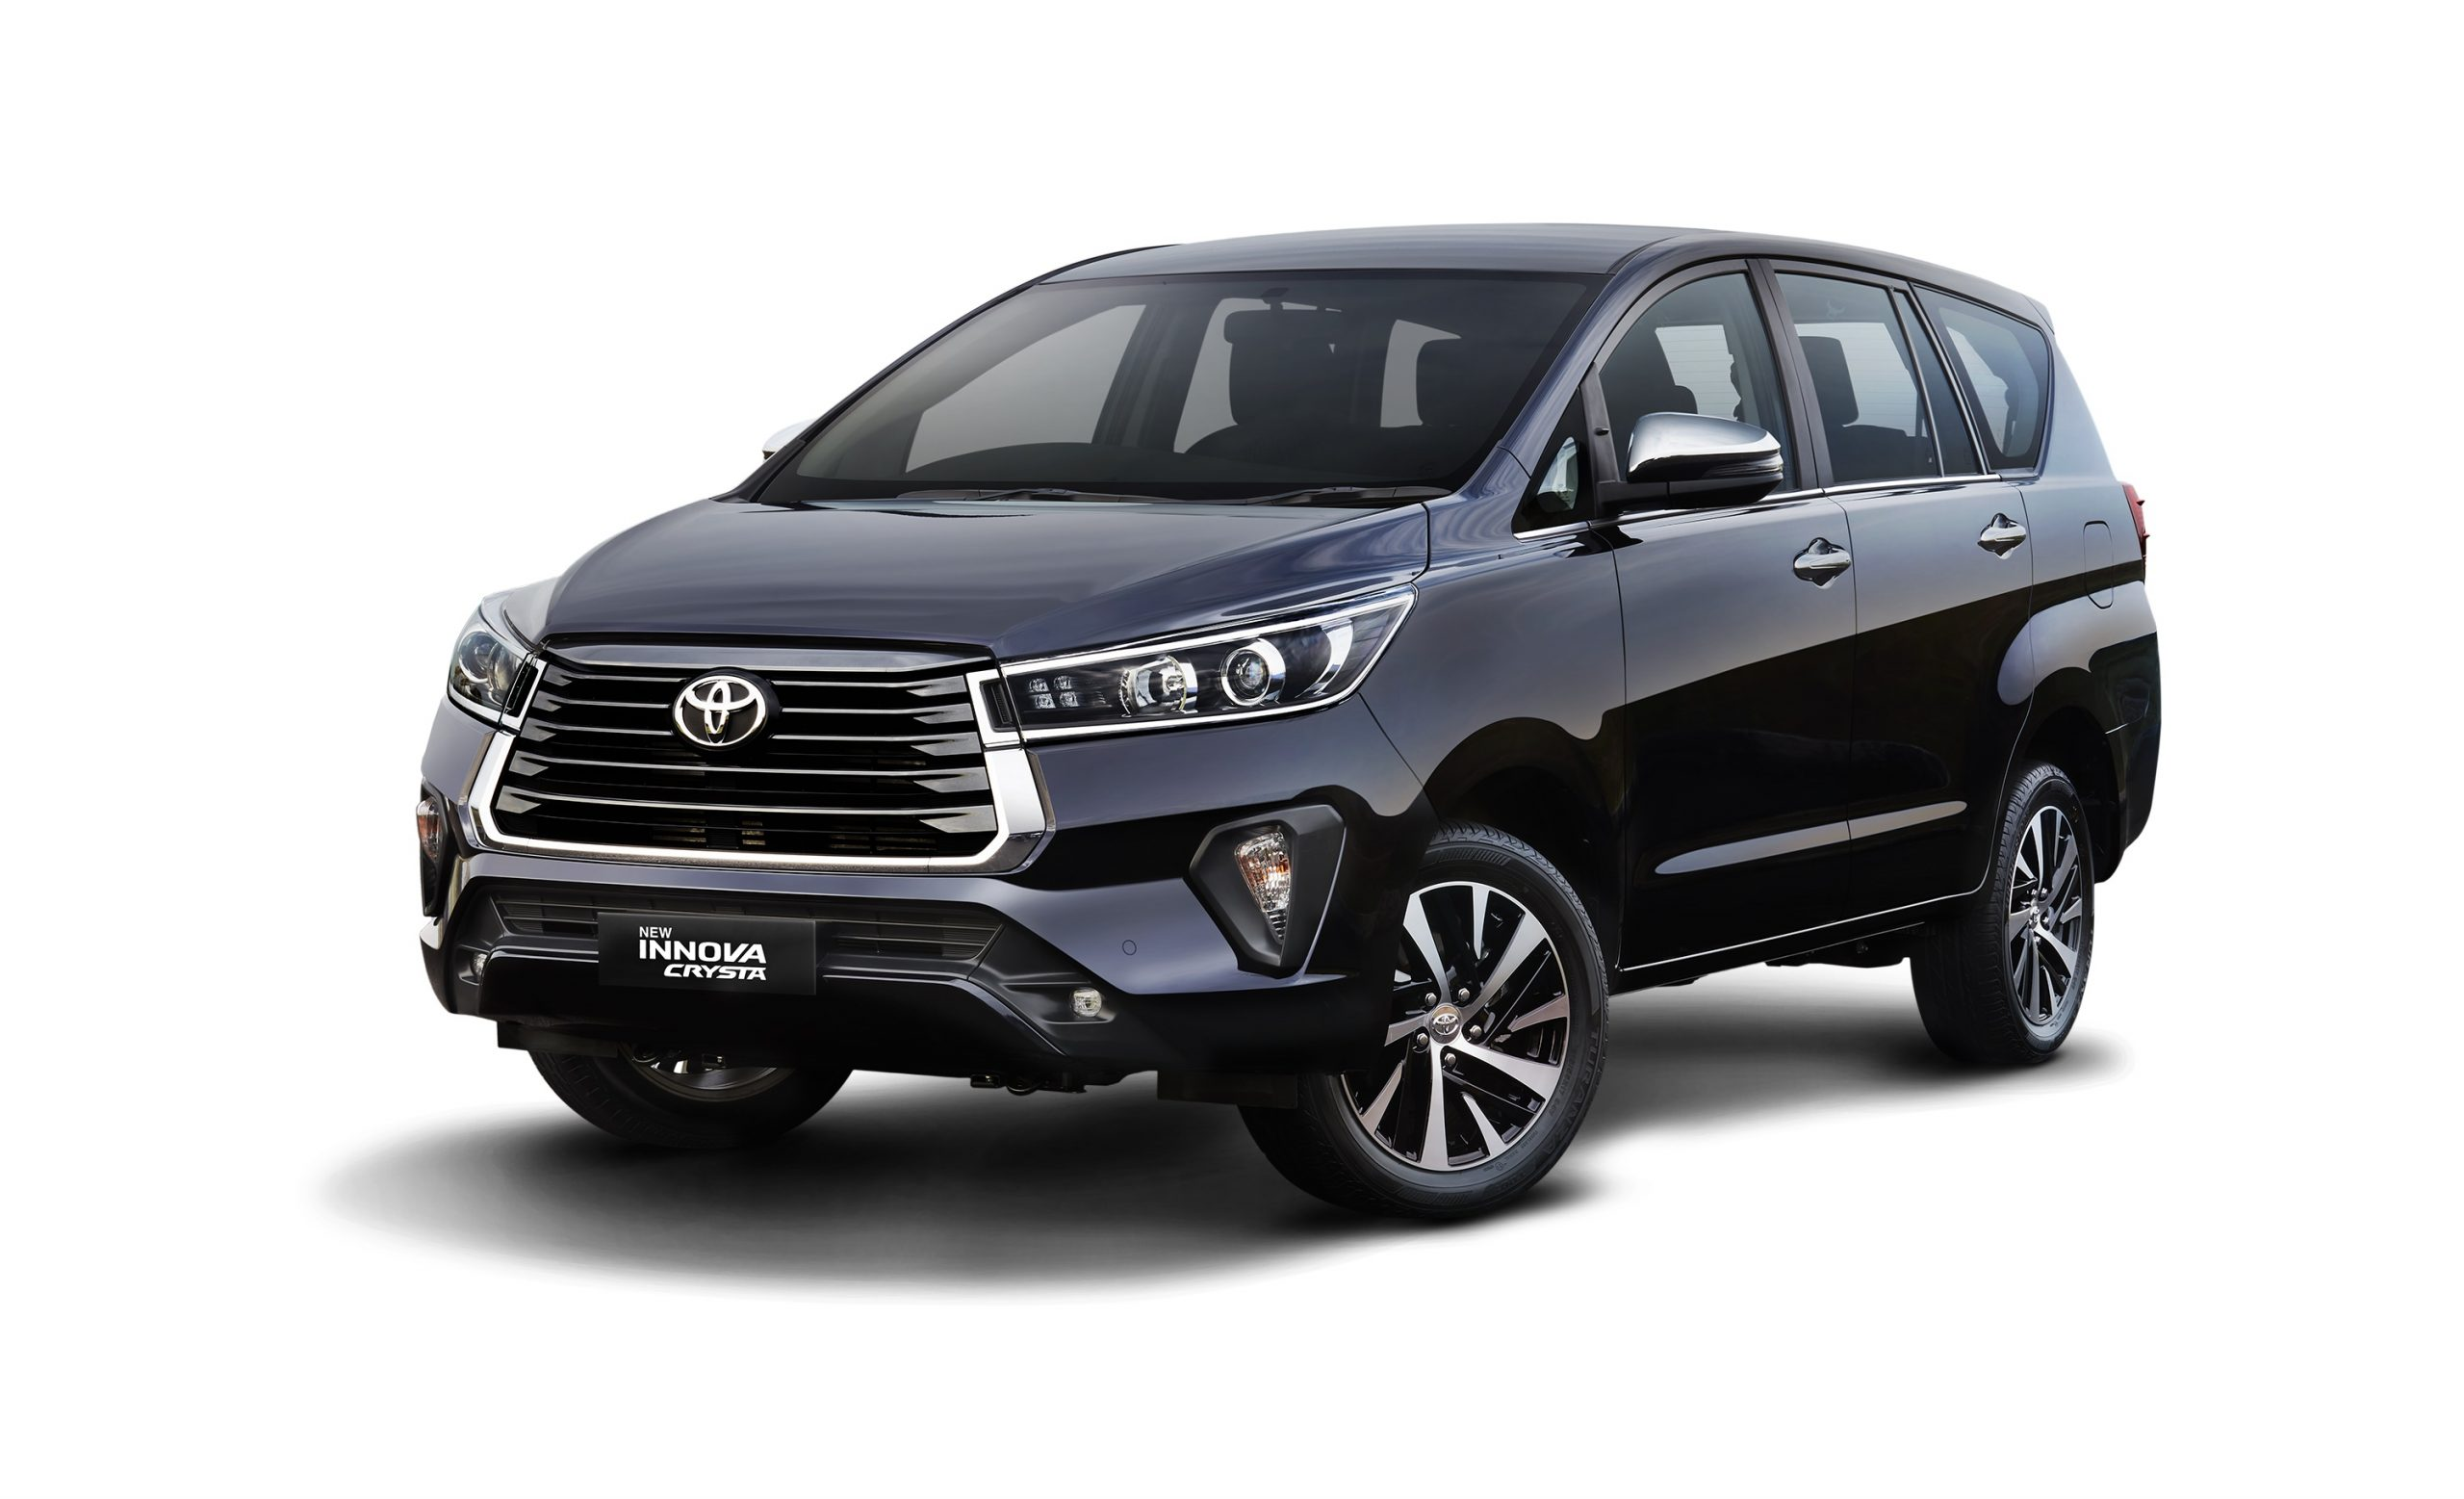 Toyota Innova Crysta 2020 india launch